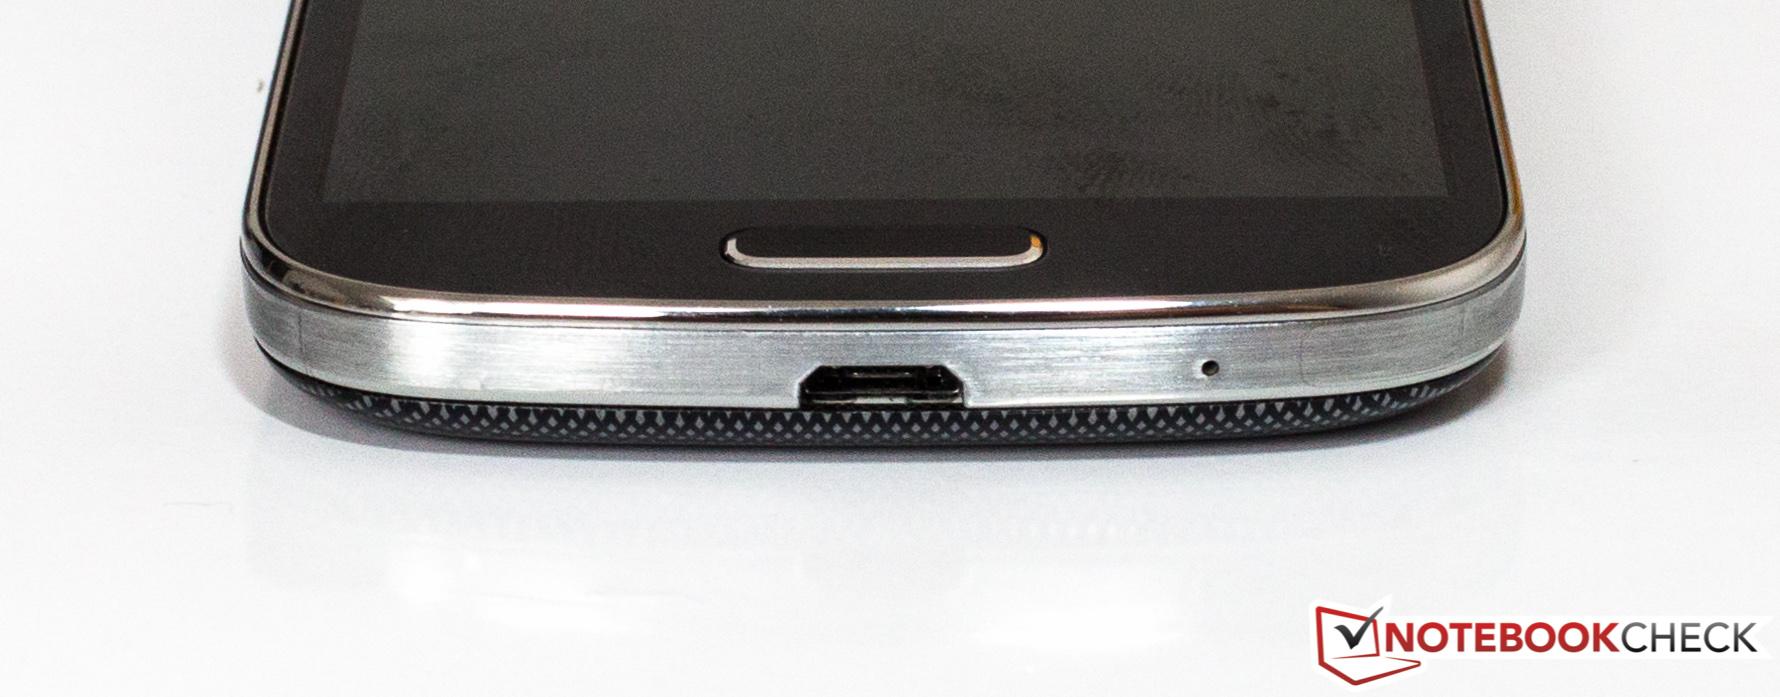 Notebook samsung galaxy s4 - Bottom Micro Usb Port